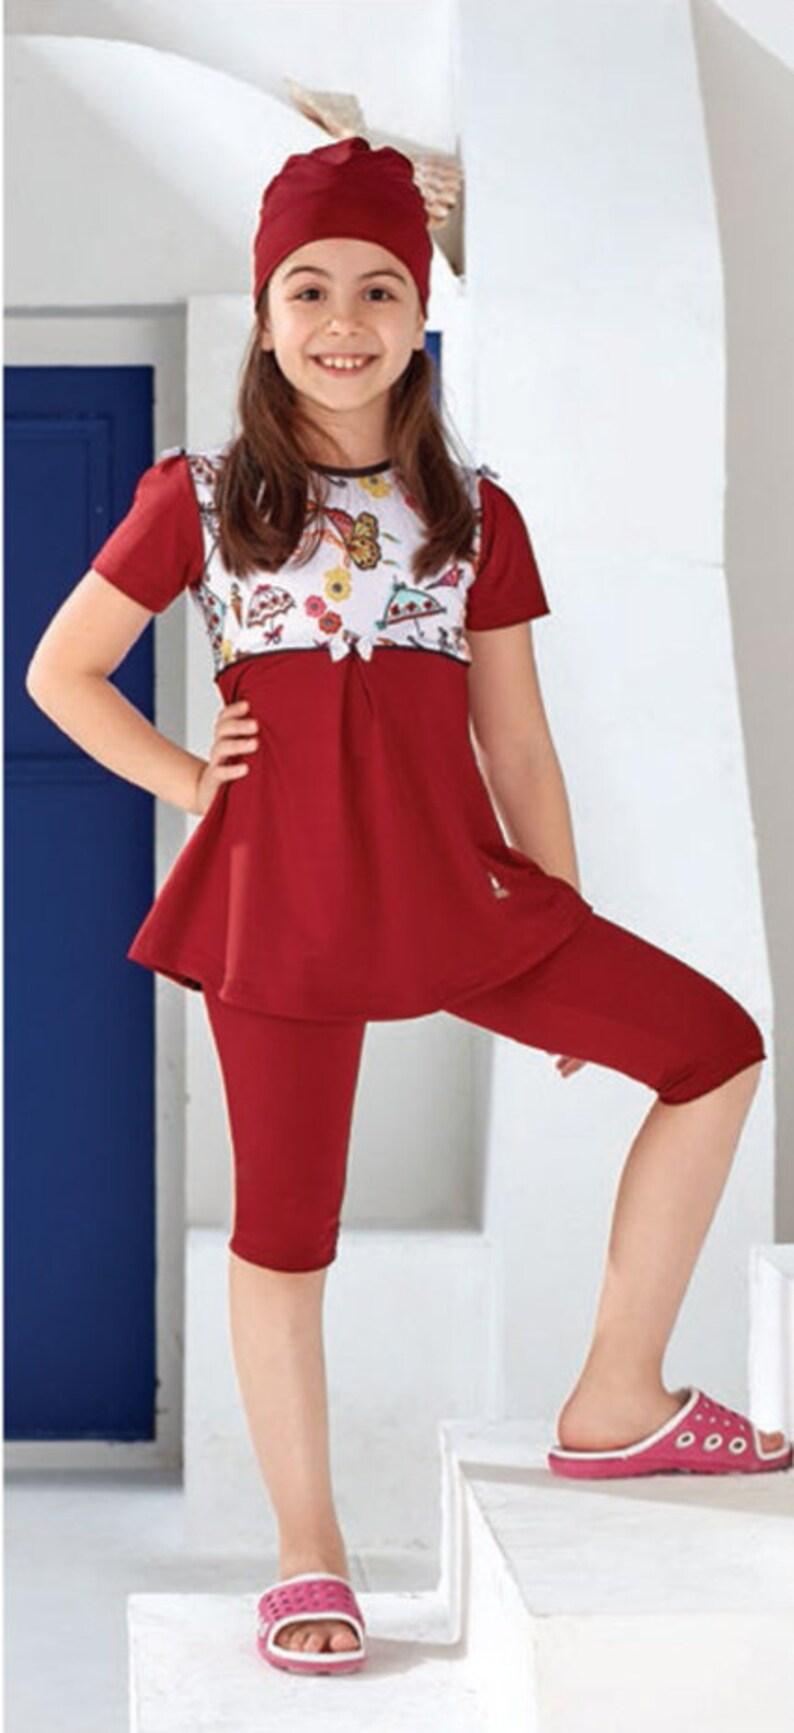 cac306eb56904 Adabkini Ece 3-piece Swimwear Modest Teenager Kids Girls   Etsy